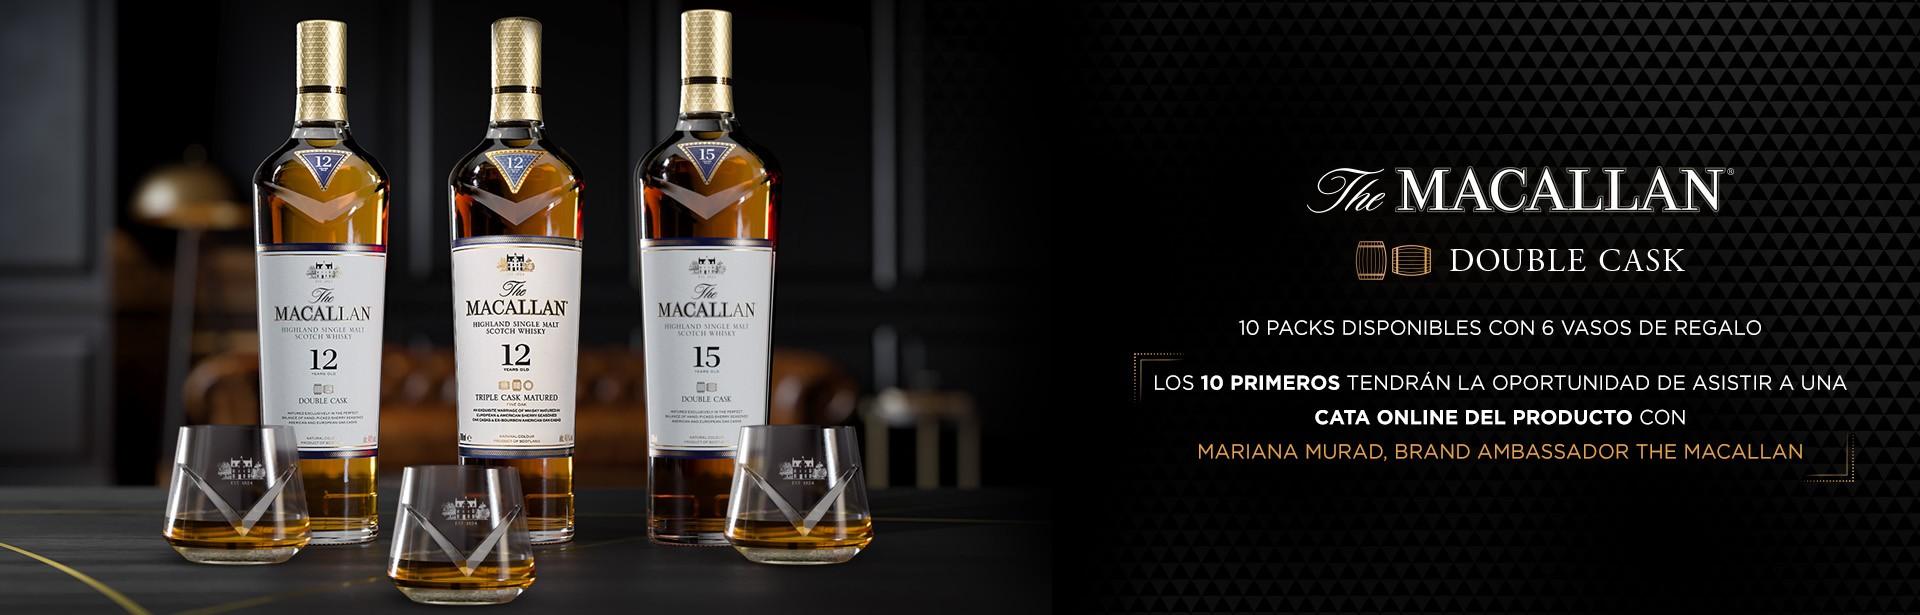 The Macallan Pack Vasos Regalo